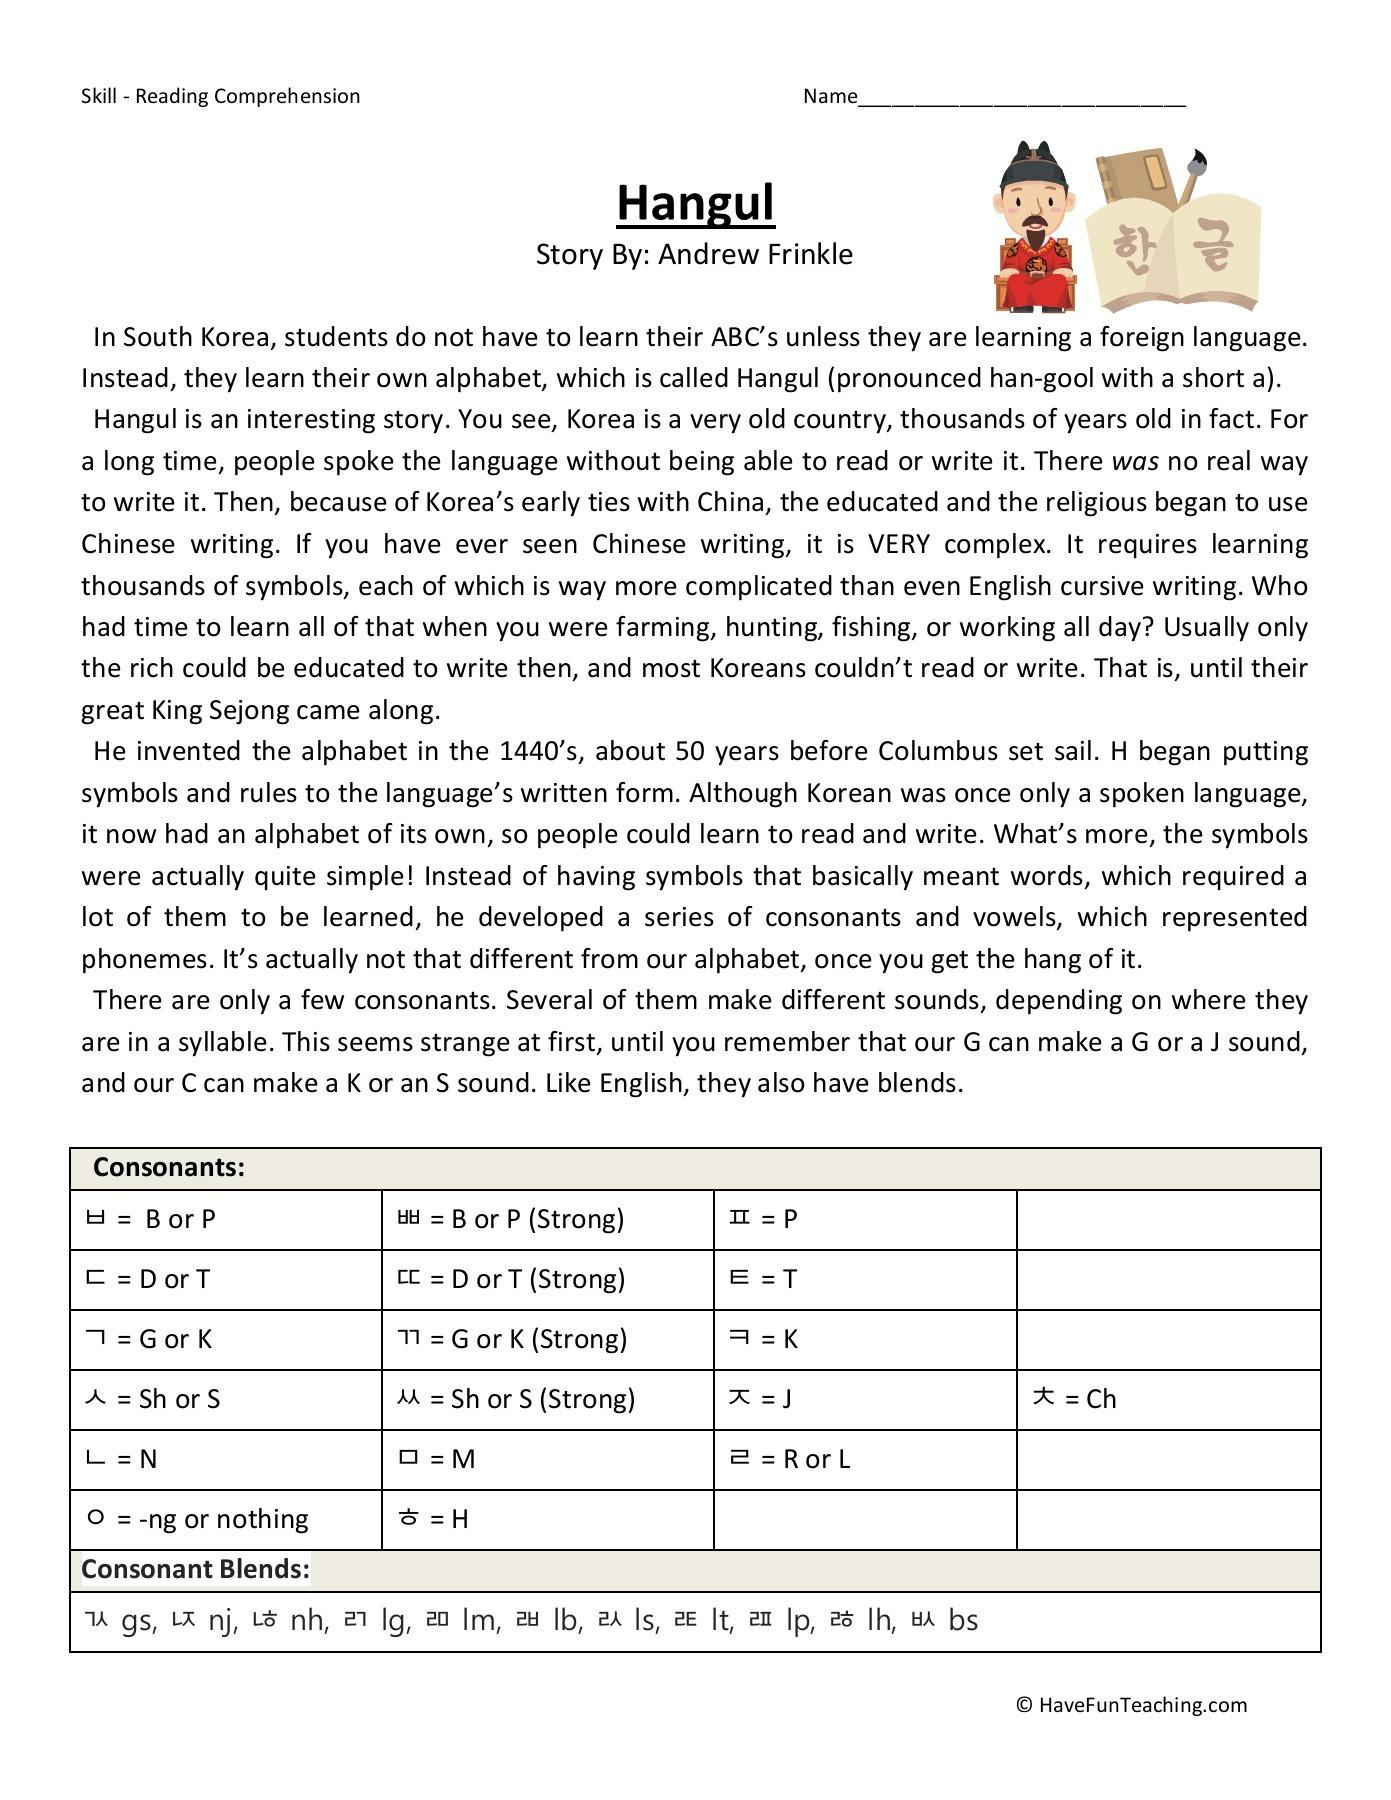 Comprehension Worksheets 6th Grade Hangul Sixth Grade Reading Prehension Worksheet Pages 1